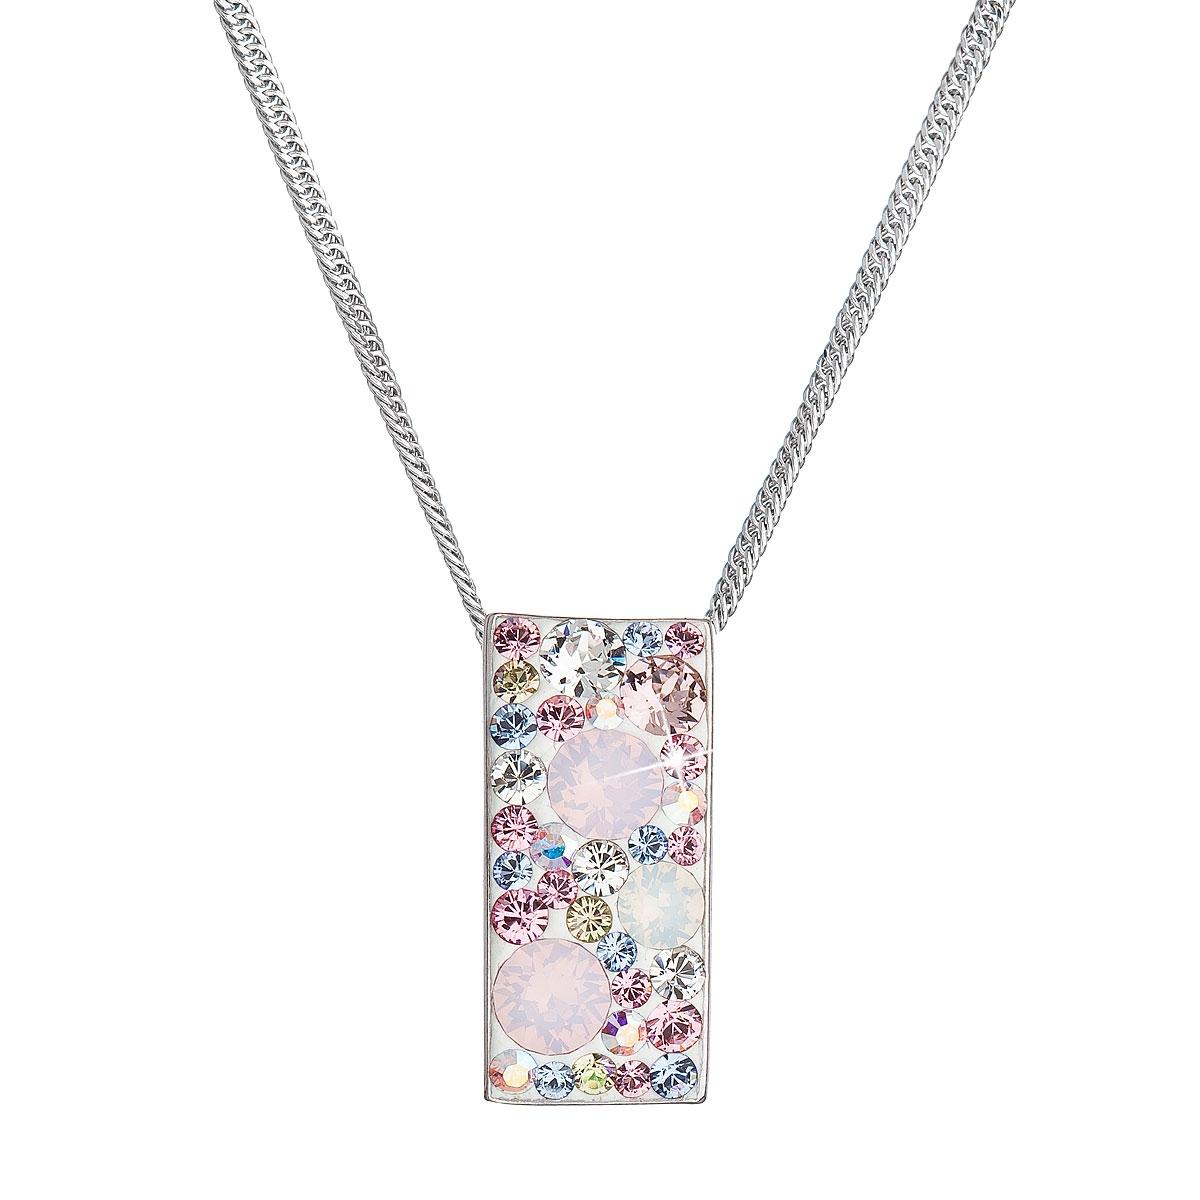 Stříbrný náhrdelník se Swarovski krystaly, Magic Rose EG4257-MR